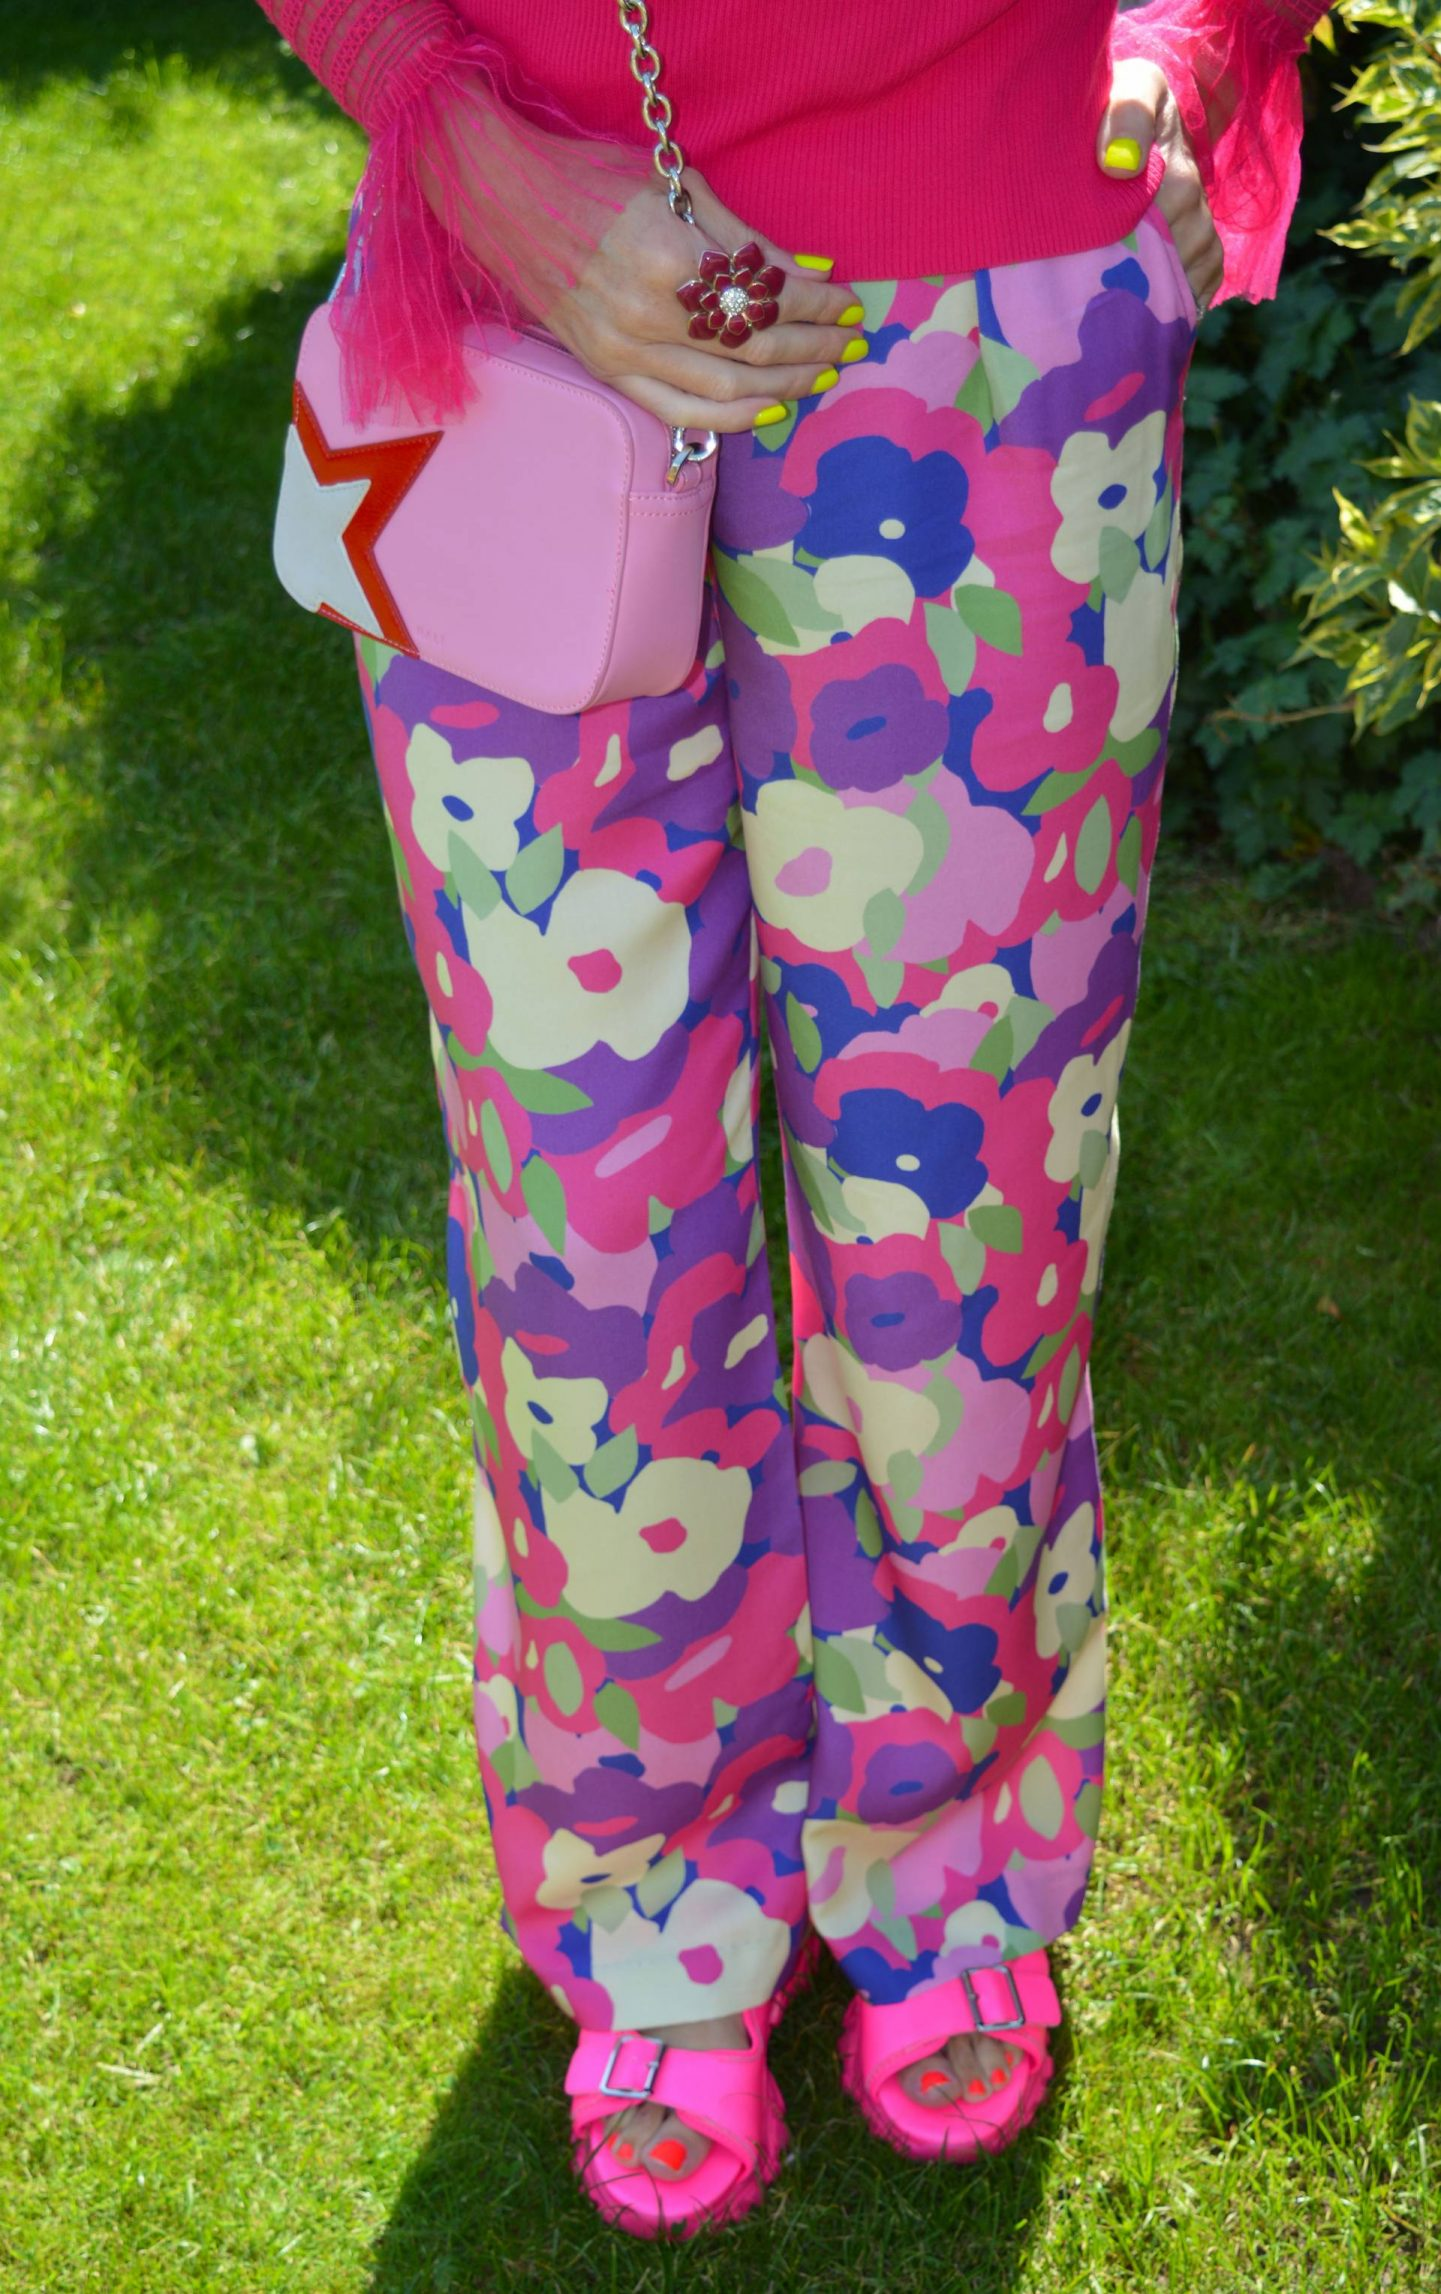 Monki purple print trousers, River Island pink cat eye sunglasses, Asos pink sporty mules, Nali pink camera bag